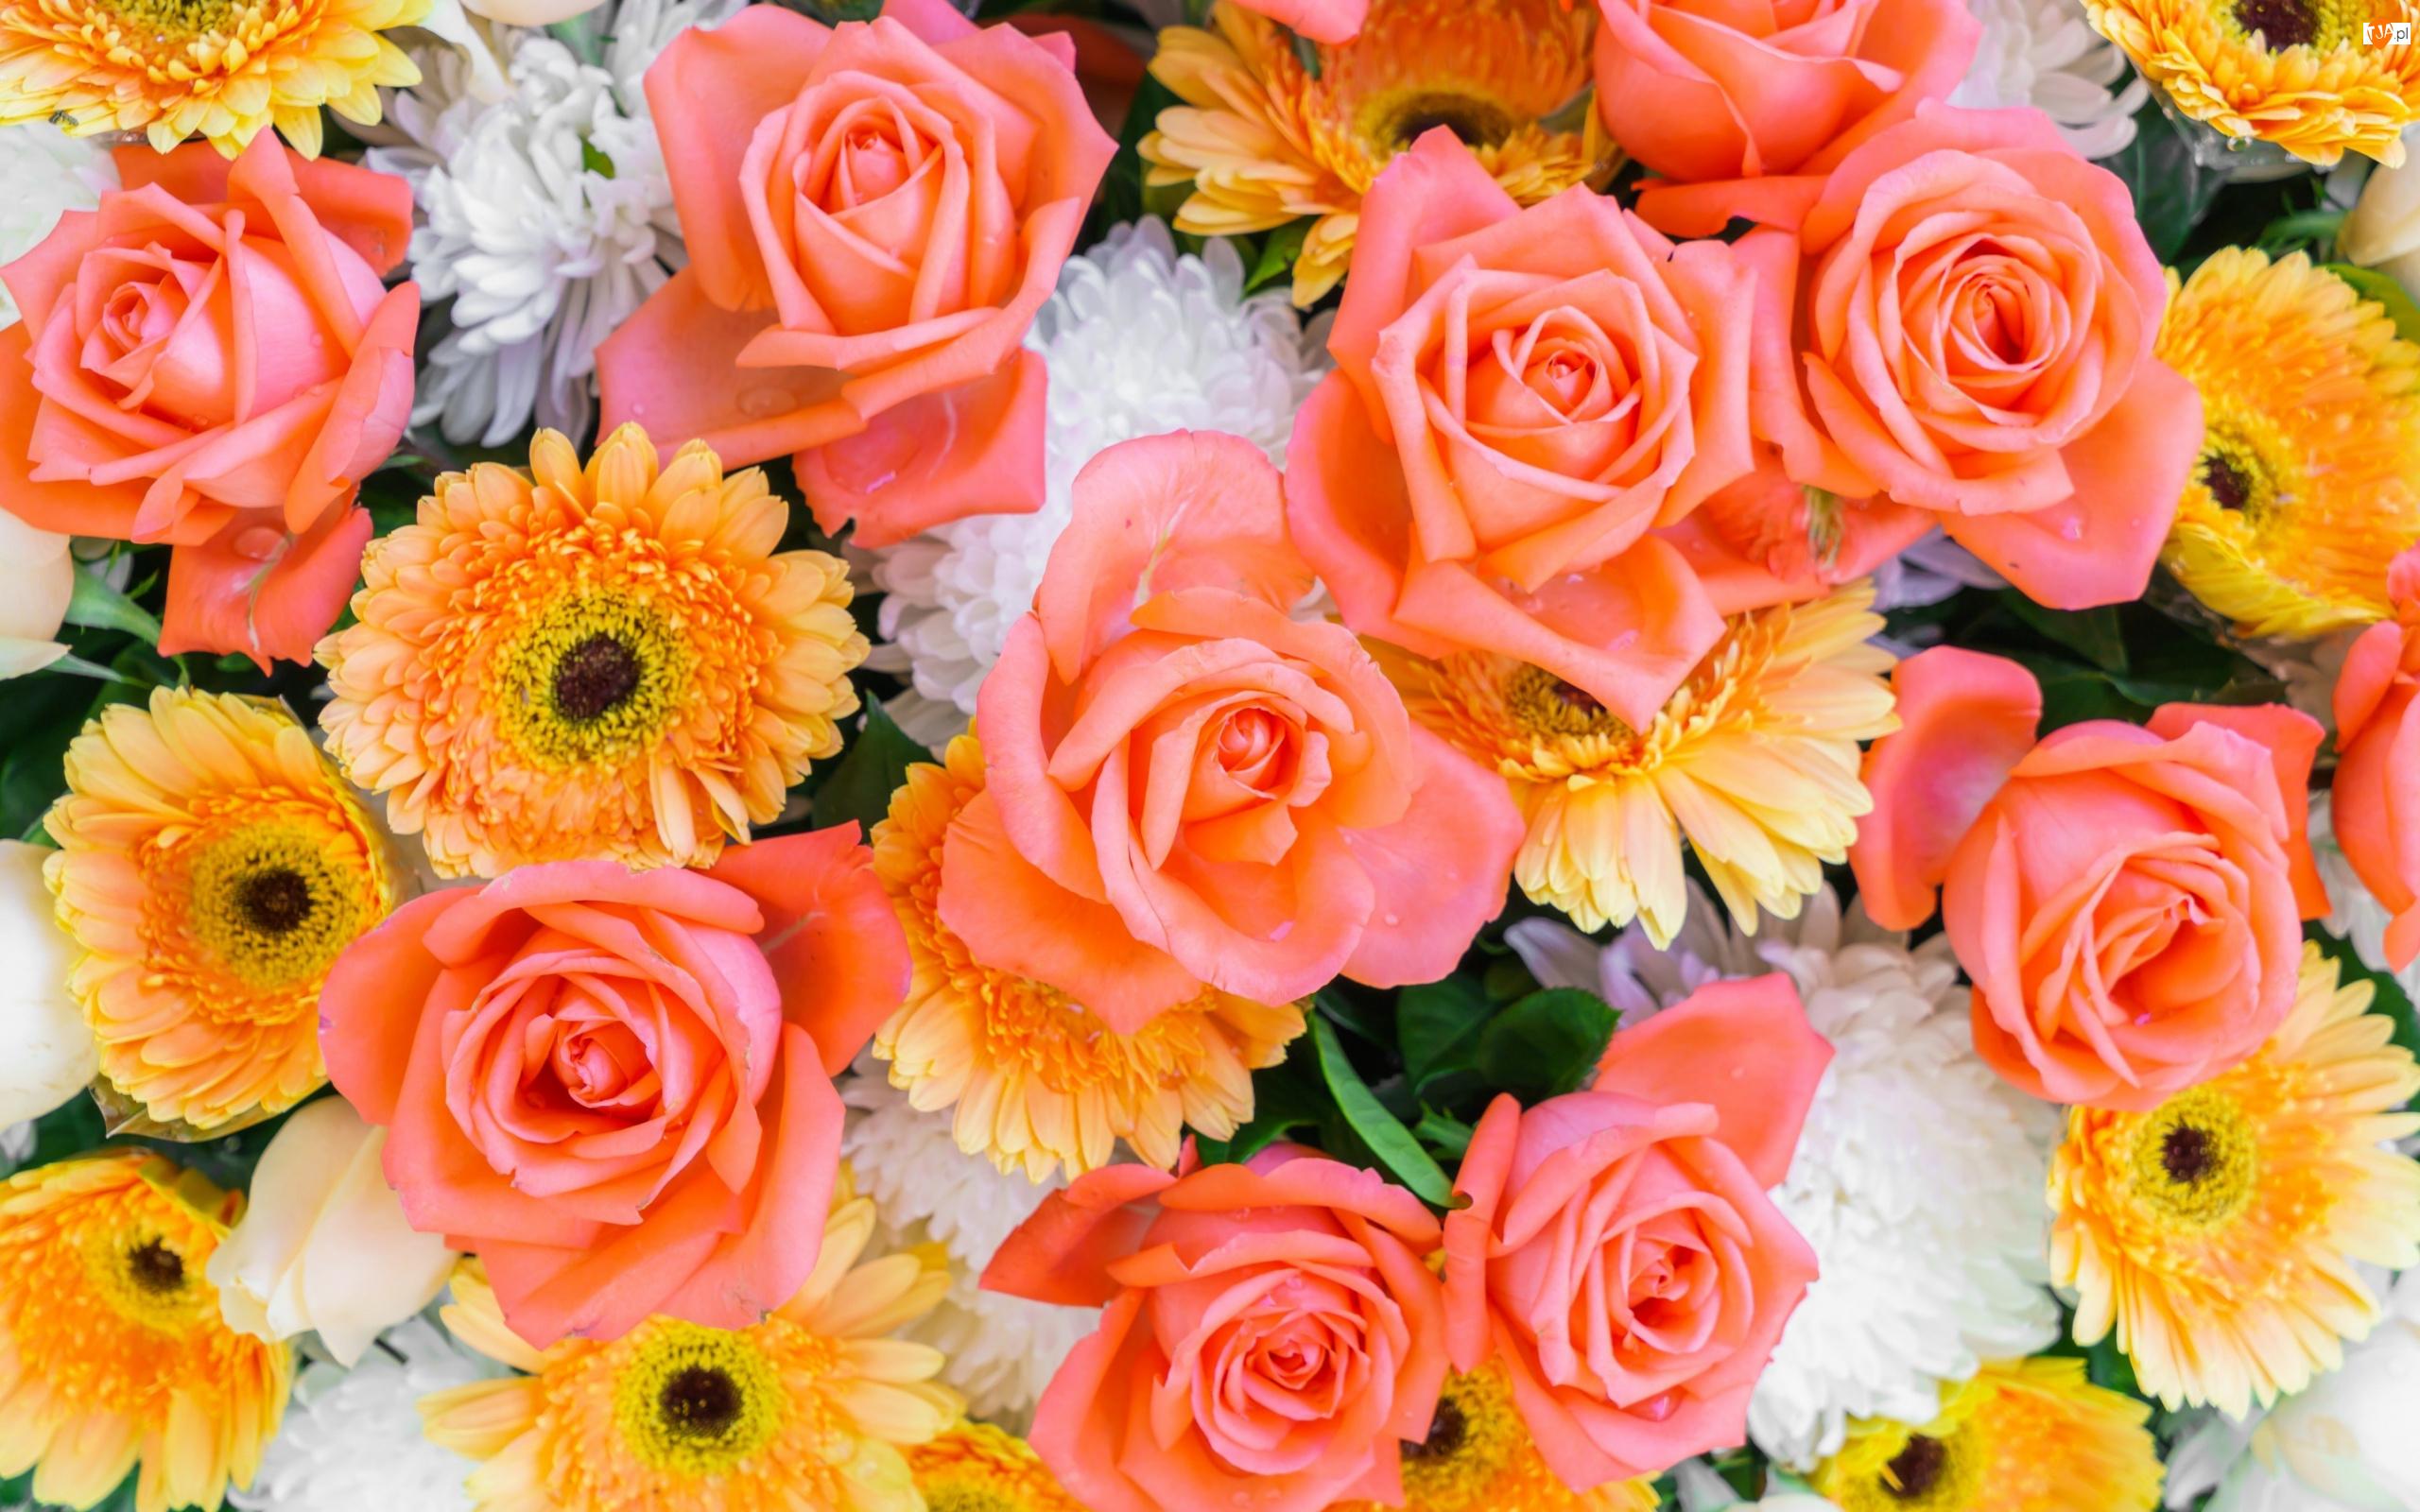 Astry, Kwiaty, Róże, Gerbery